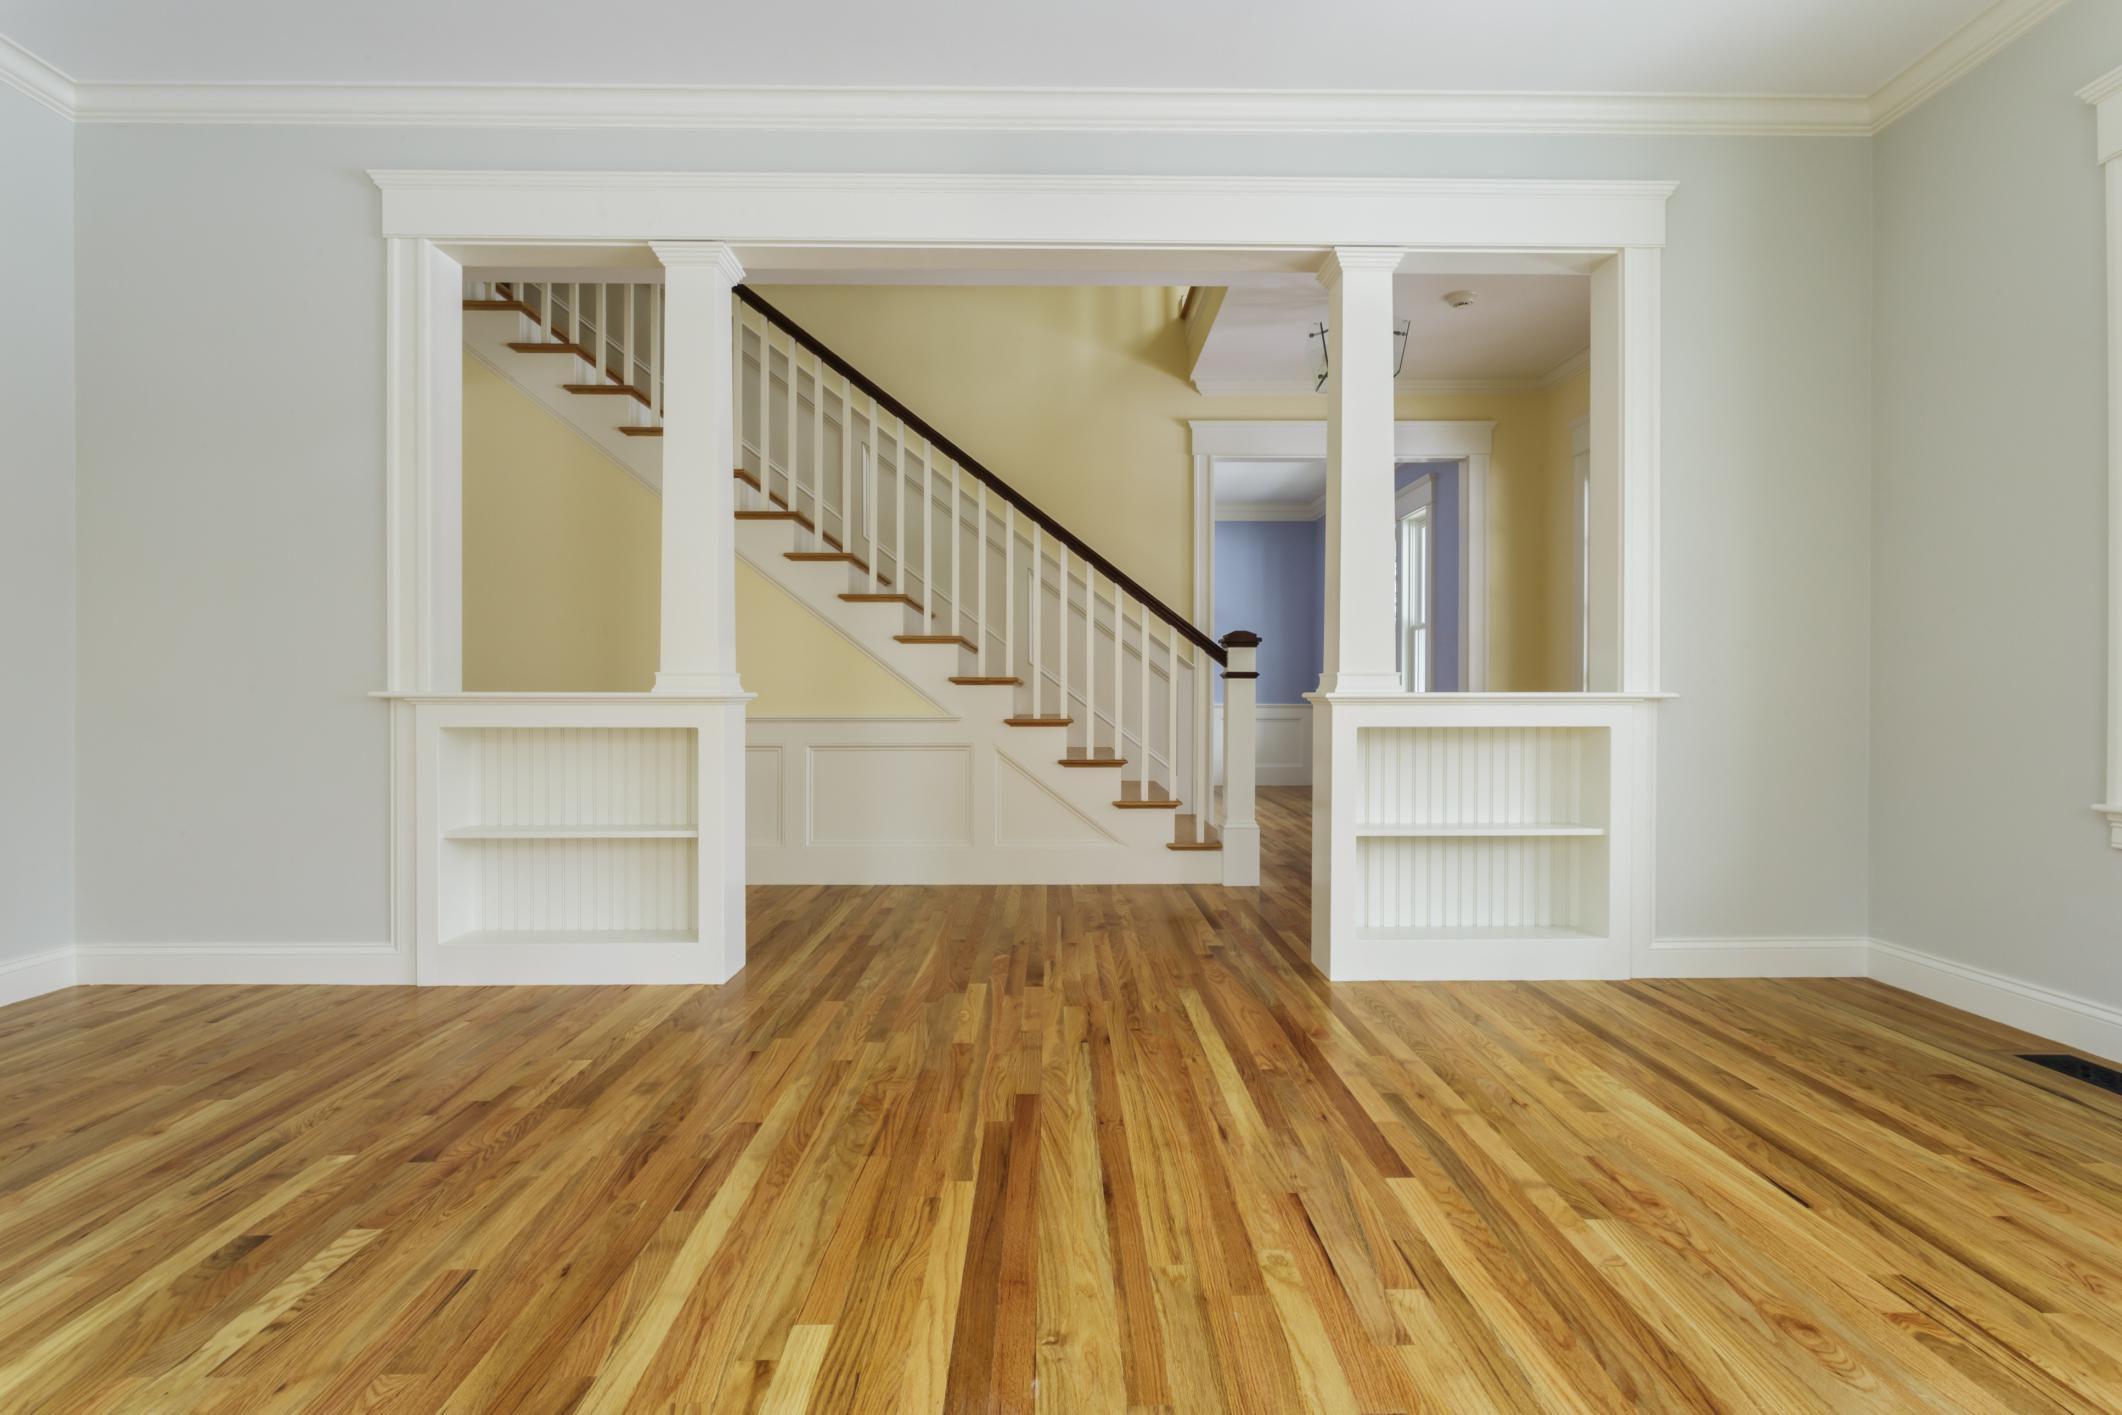 hardwood floor repair kit of guide to solid hardwood floors throughout 168686571 56a49f213df78cf772834e24